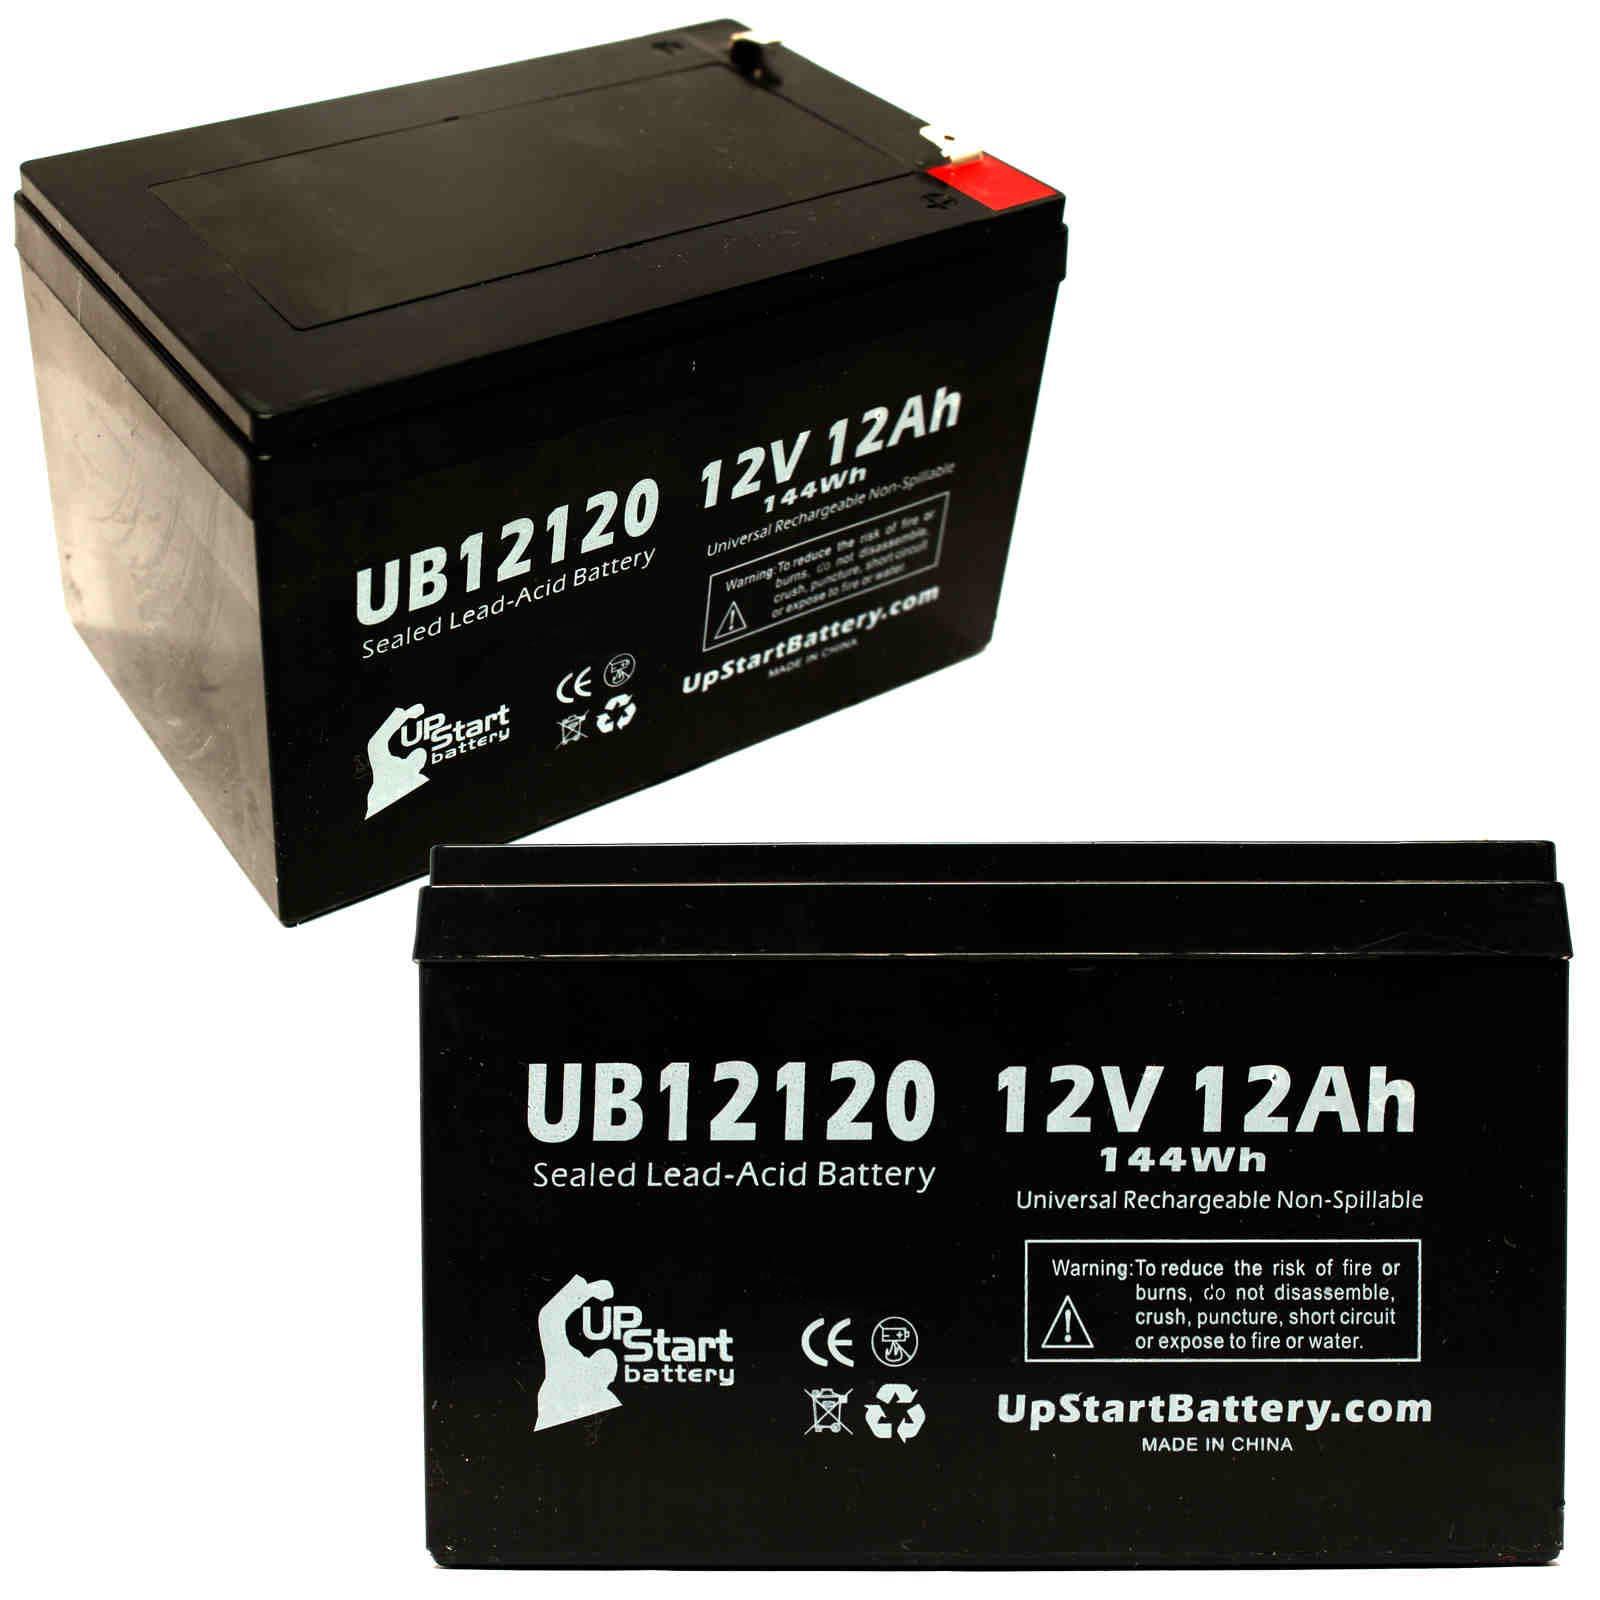 [SCHEMATICS_4JK]  2-pack Apc rbc32 33 Battery UB12120 12V 12Ah Sealed Lead Acid SLA AGM | eBay | Apc Rbc32 Battery Wiring Diagram |  | eBay